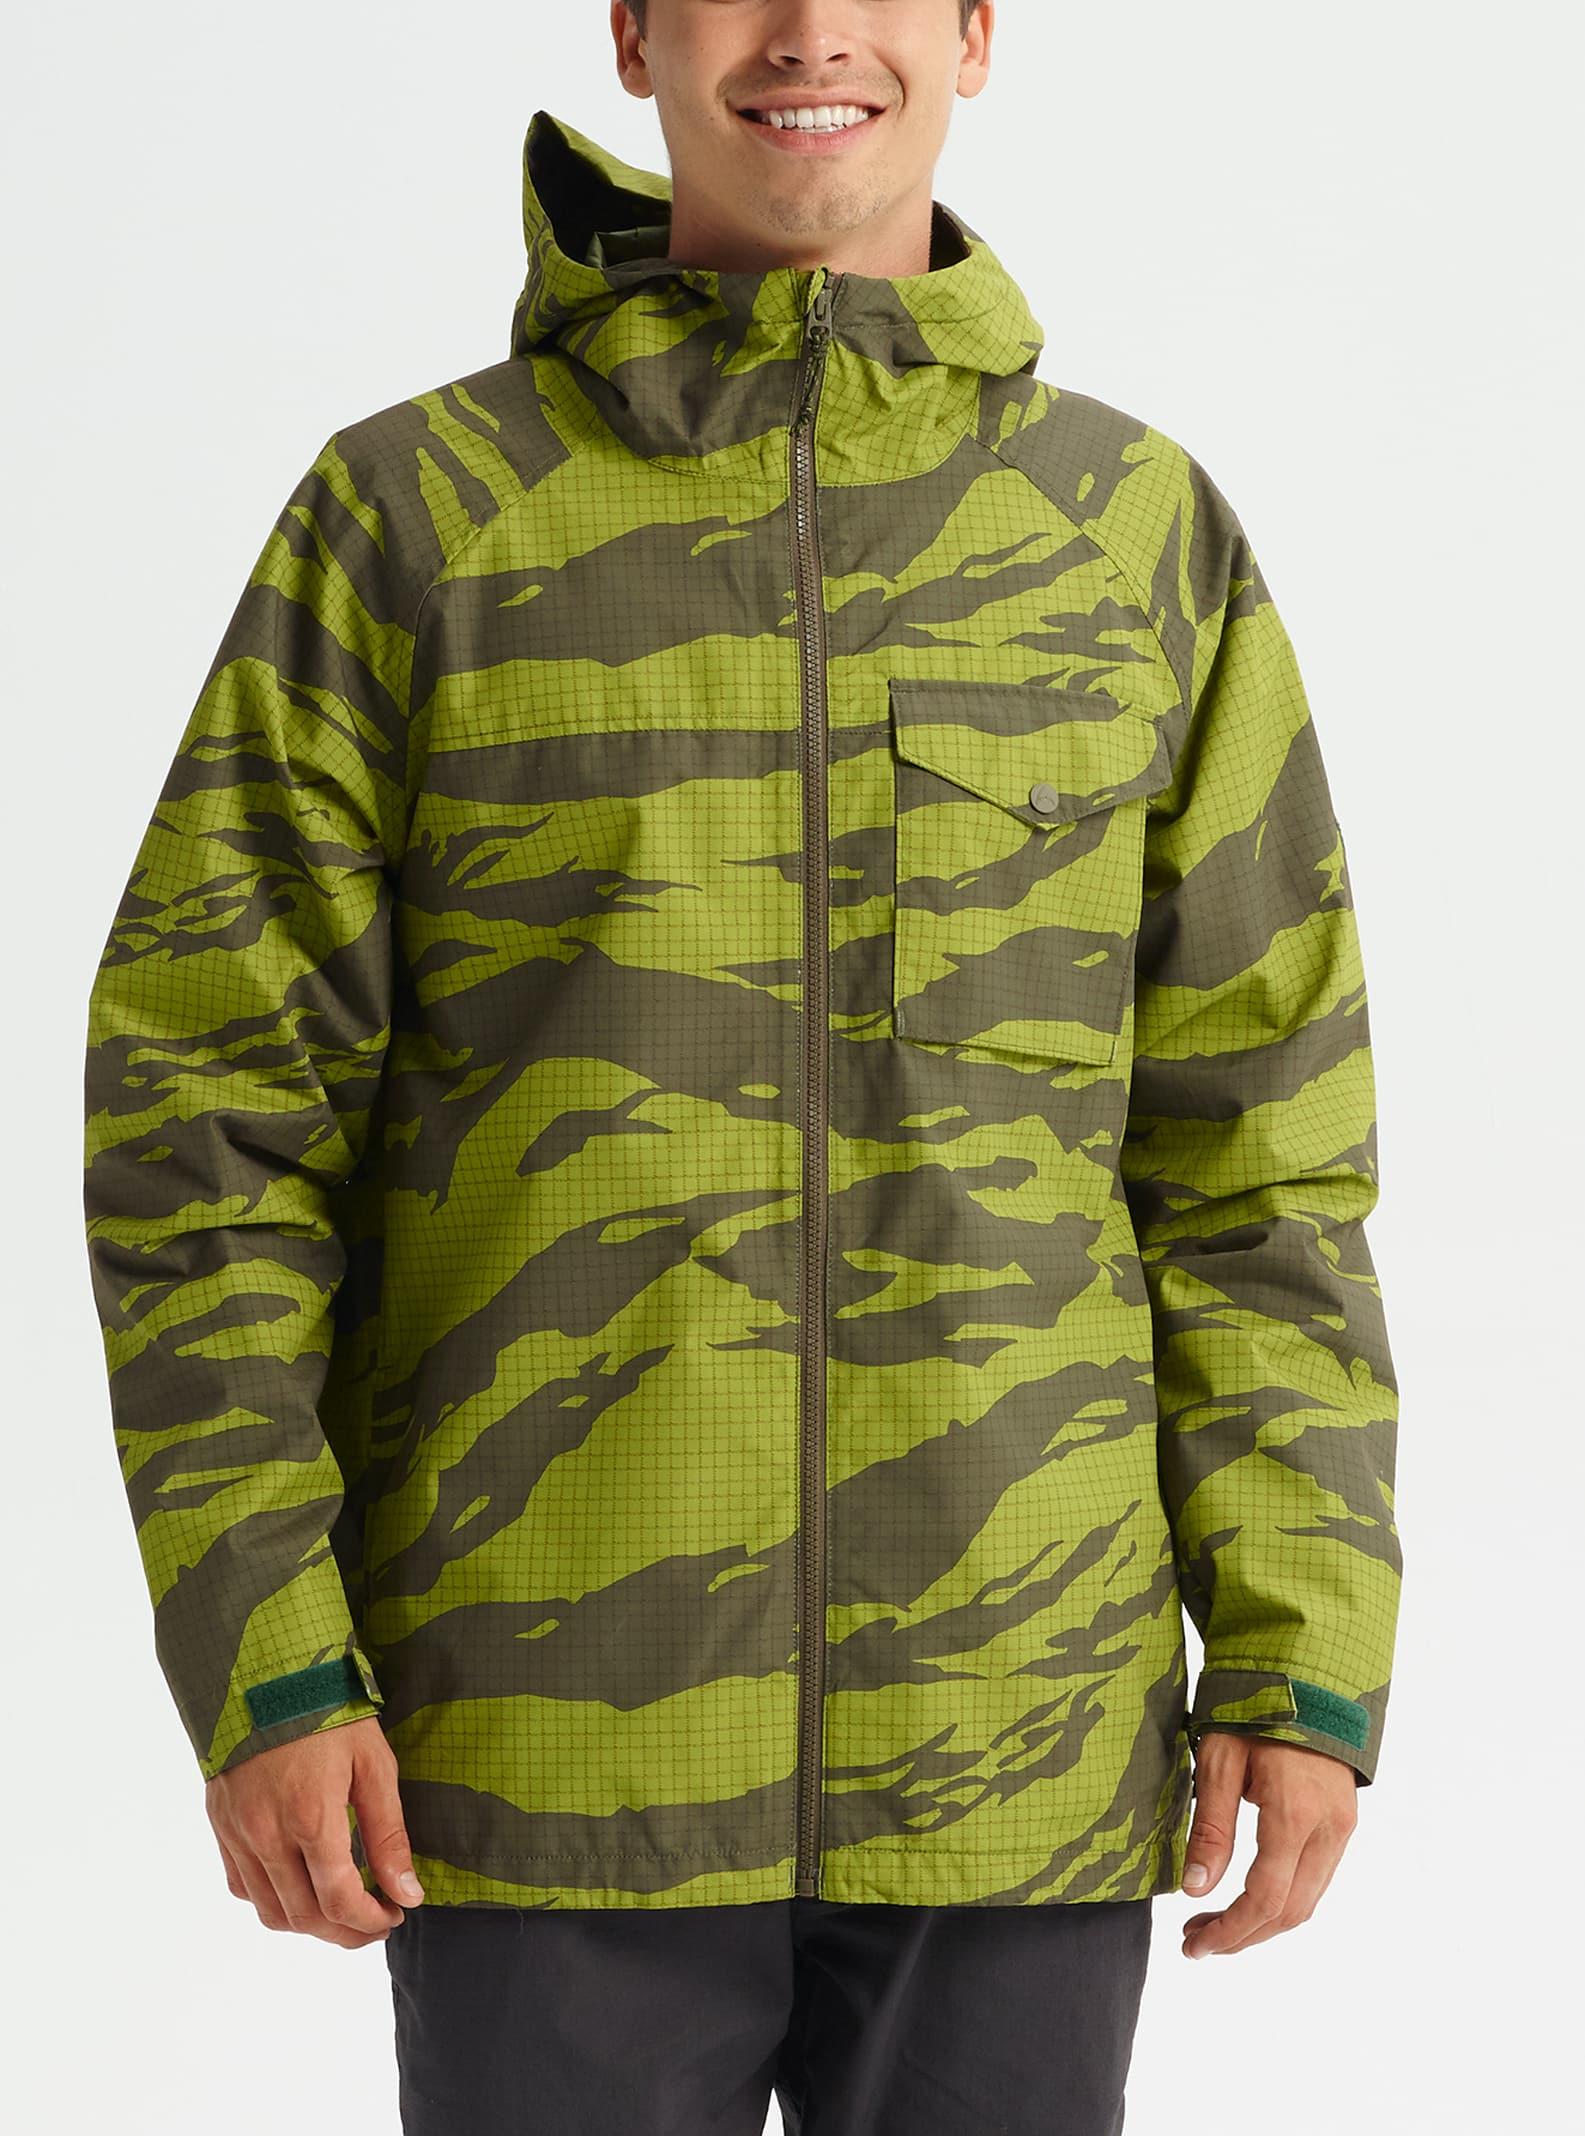 d0190cd2ae067 Men s Jackets   Outerwear